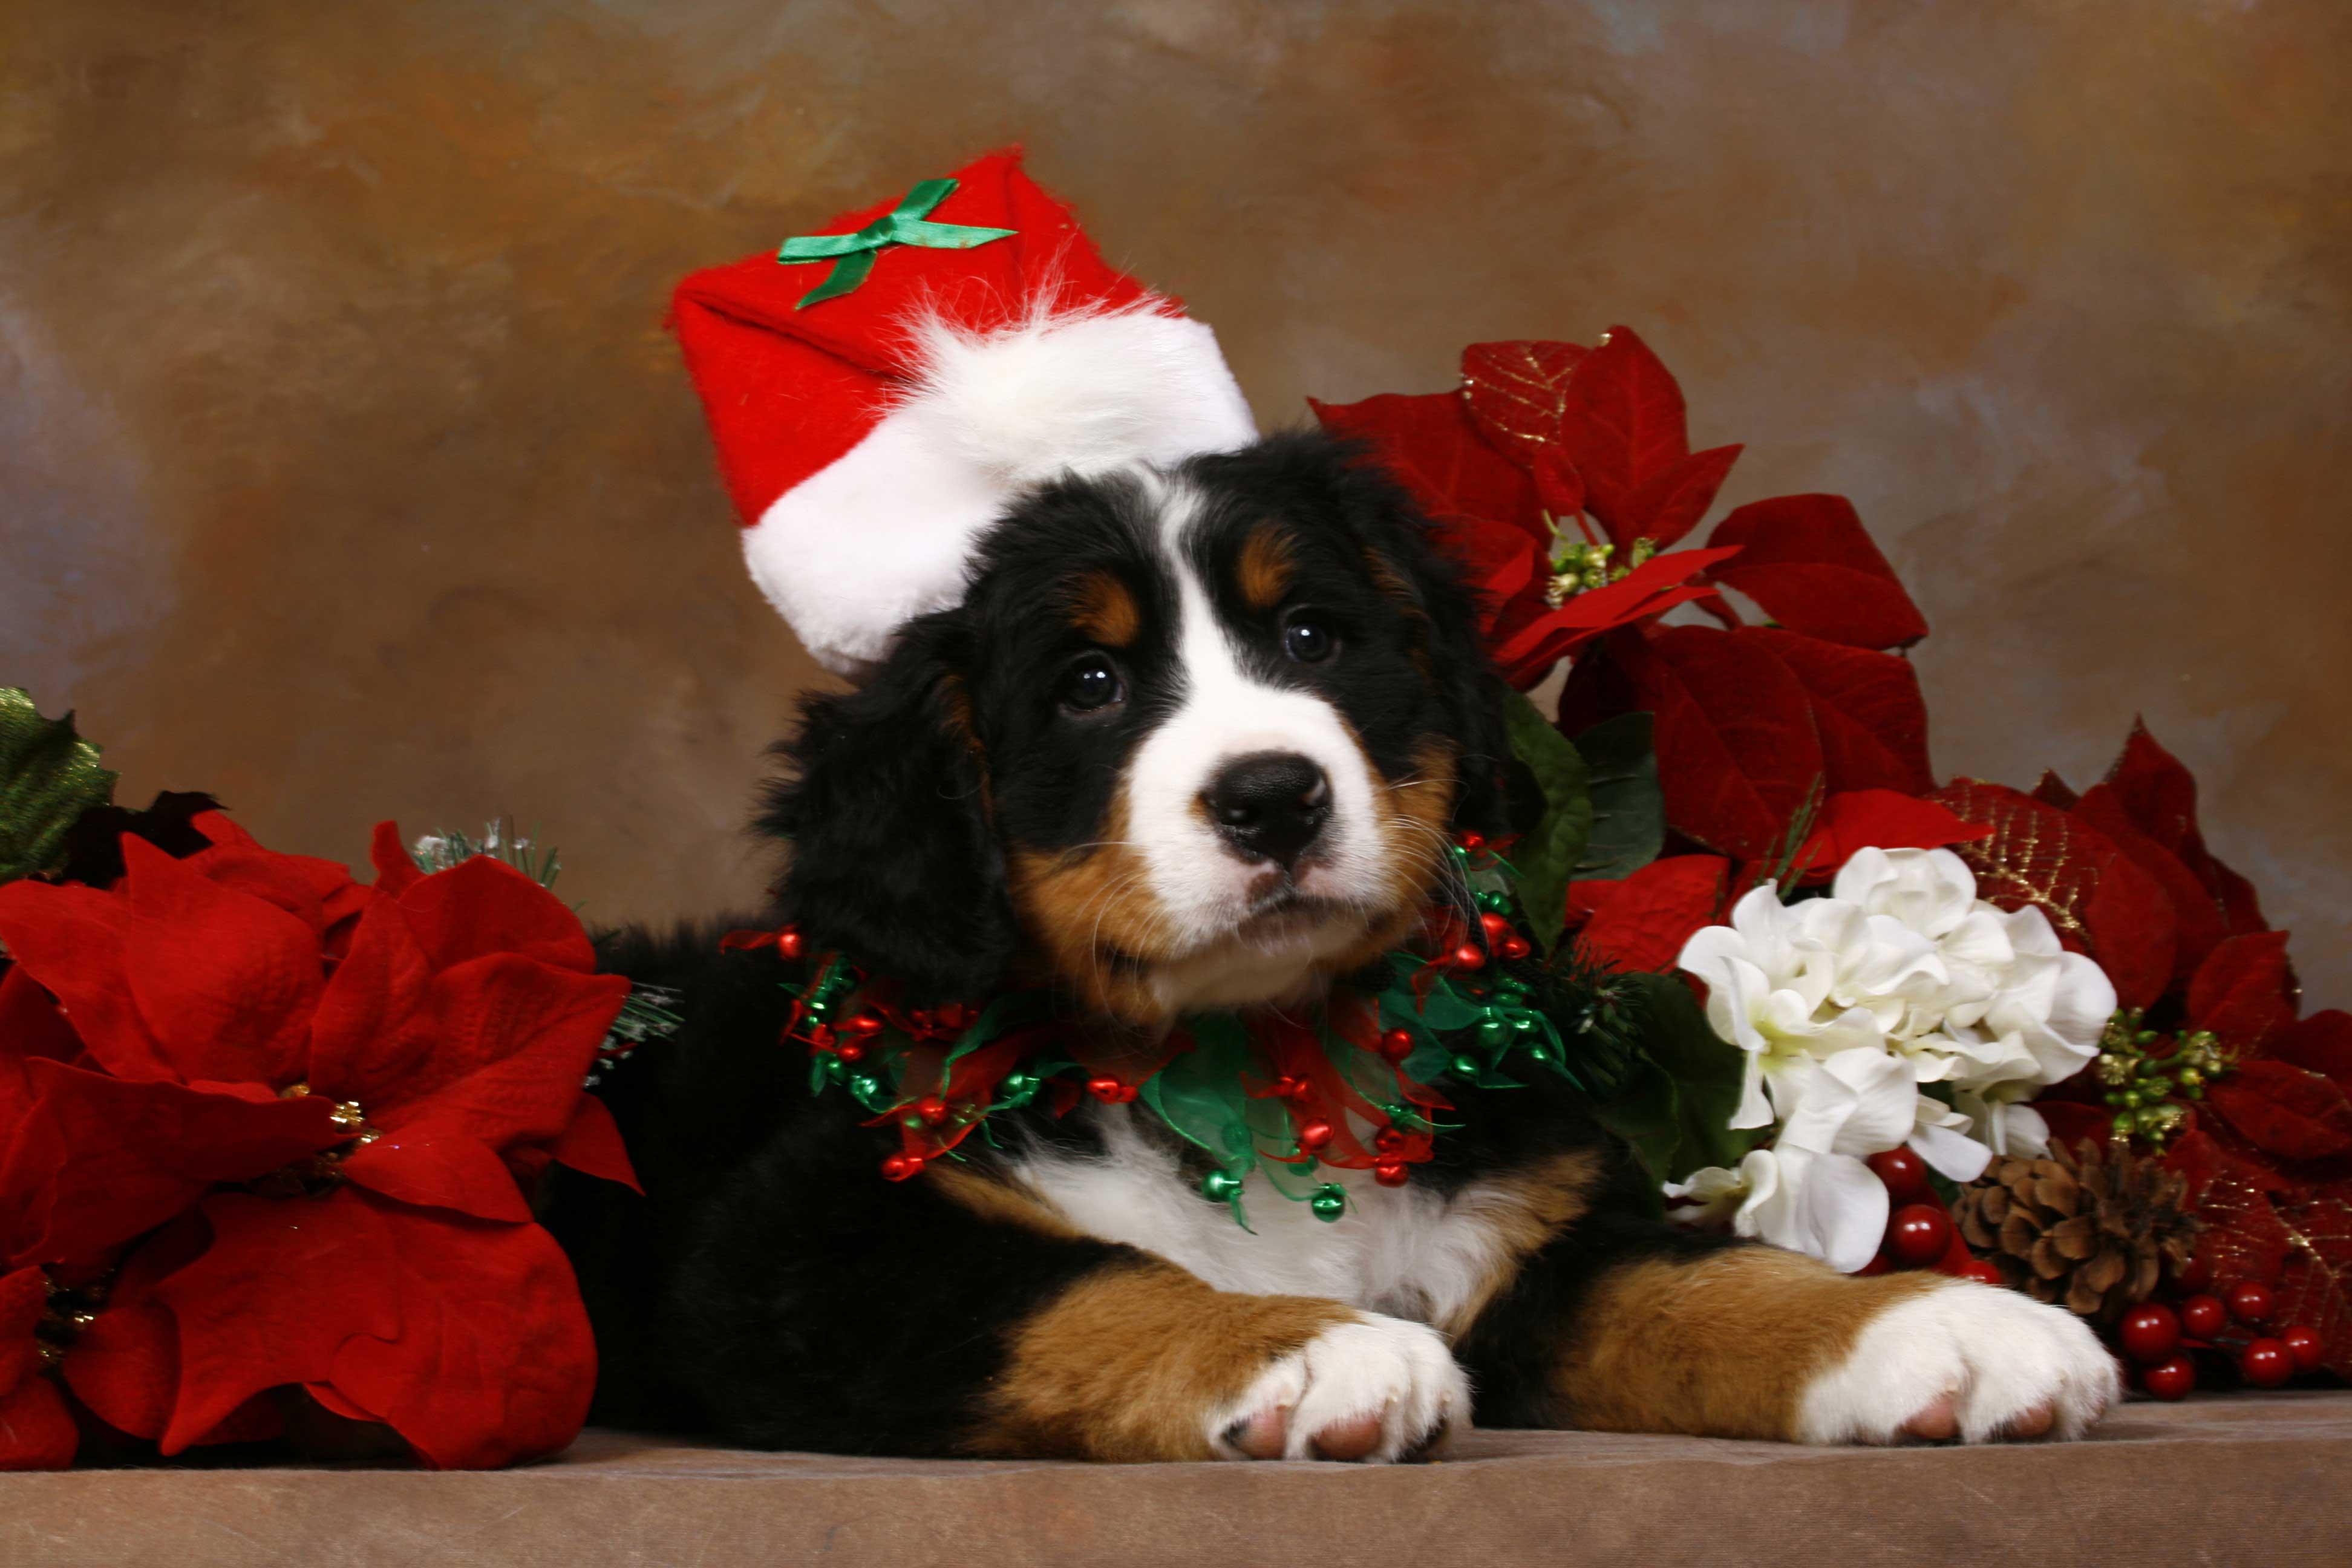 Cute Christmas Animal Wallpapers - Top Free Cute Christmas ...